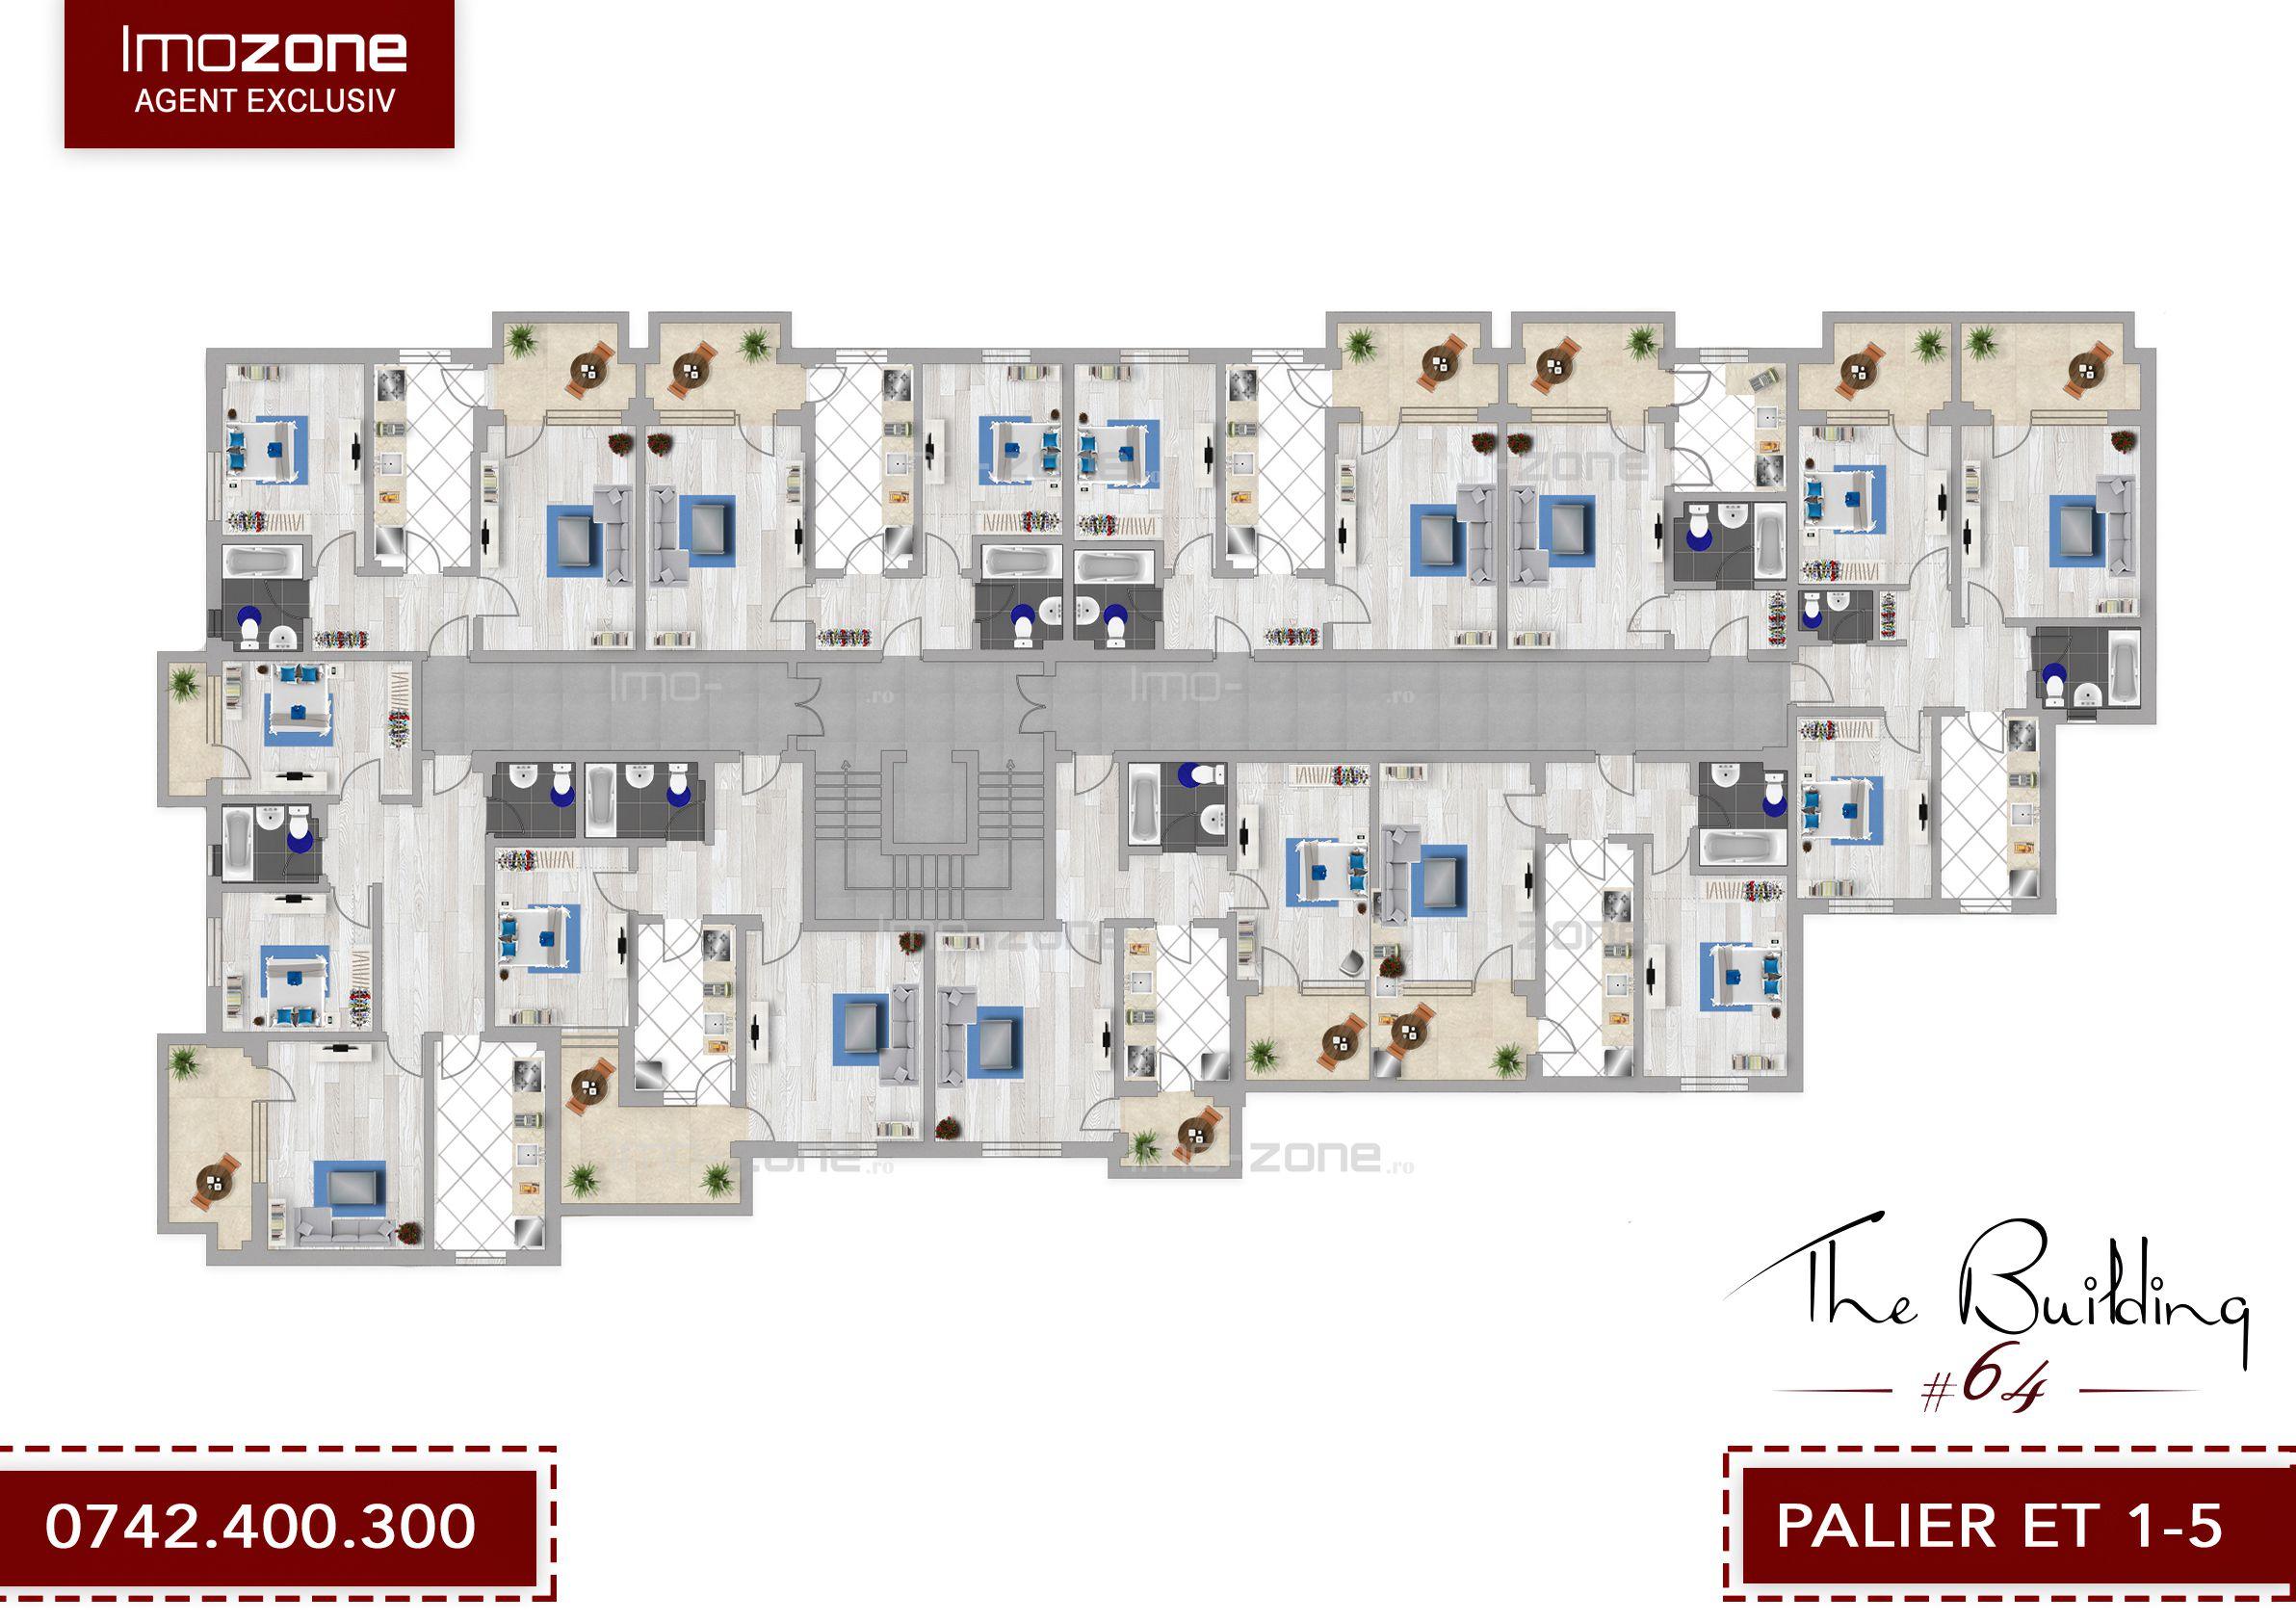 Apartament 2 camere Drumul Taberei, Valea Doftanei ANL Brancusi, 57 mp, la cheie